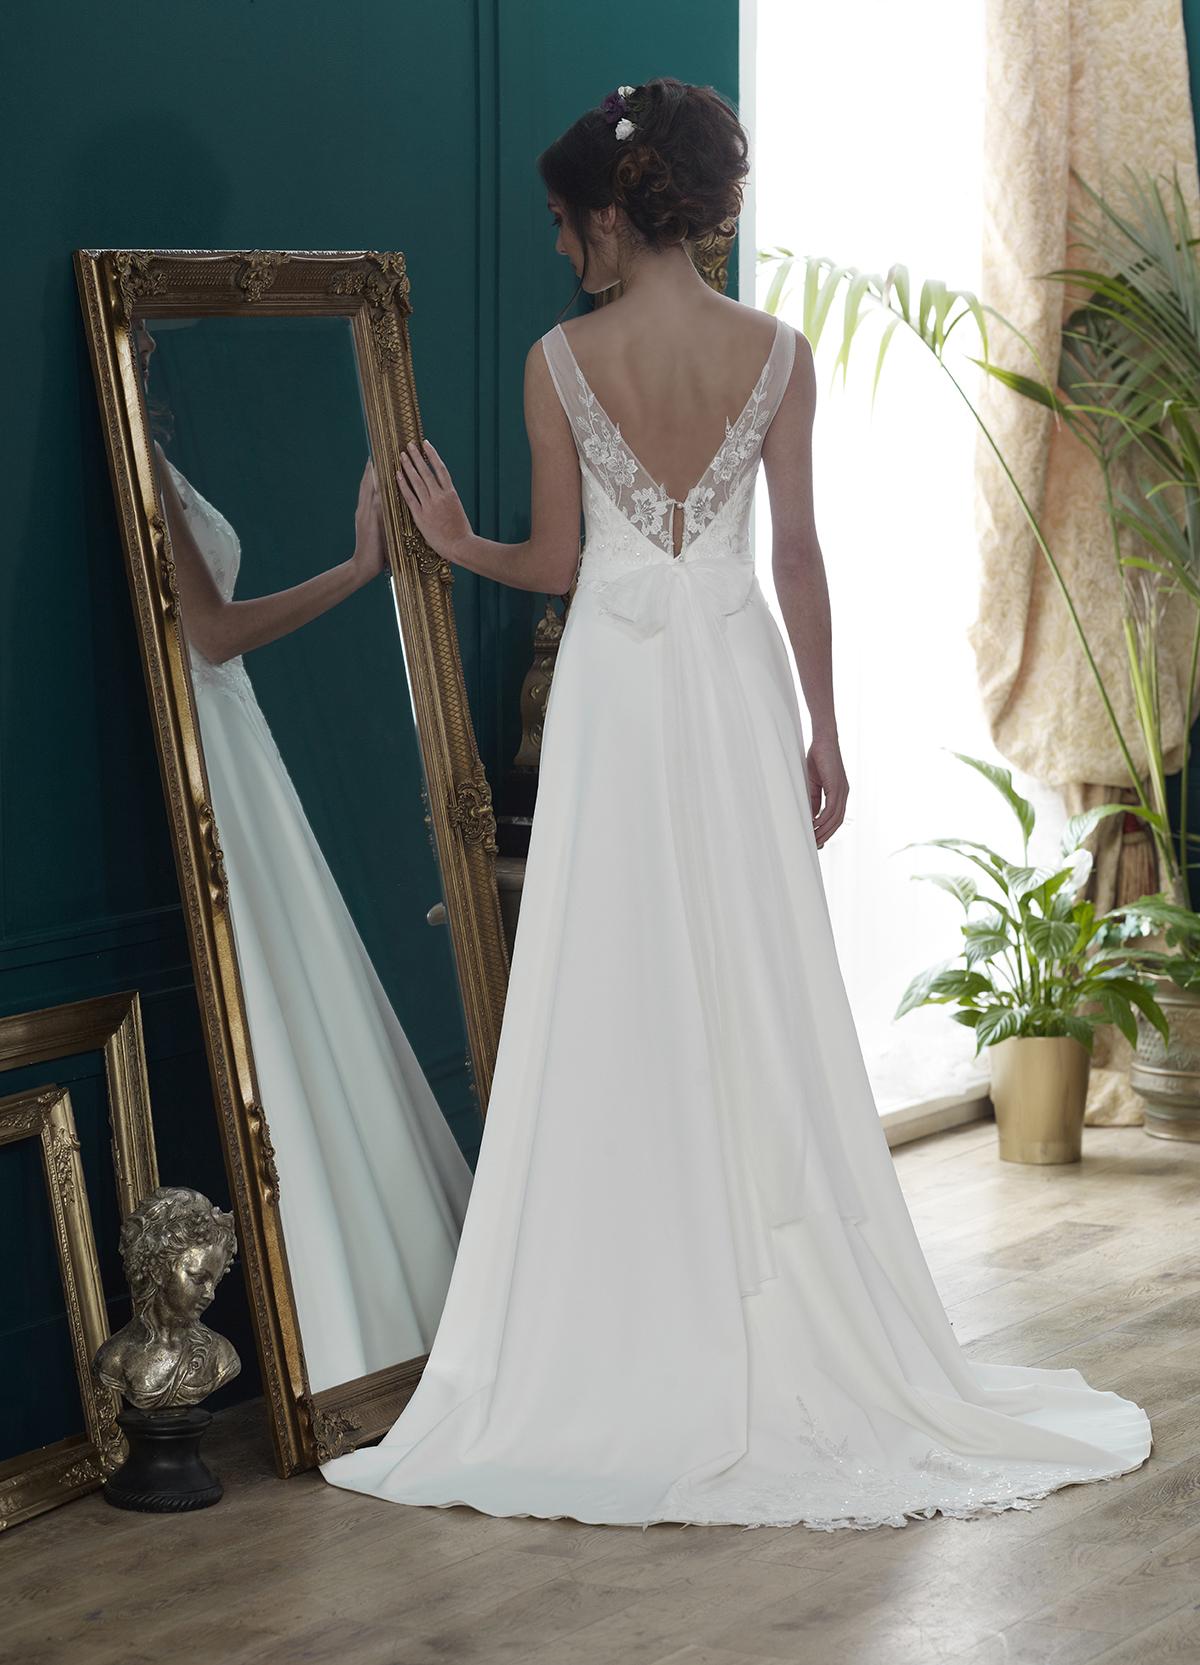 Nicola Anne - Handmade Couture Wedding Dresses | Love My Dress® UK ...